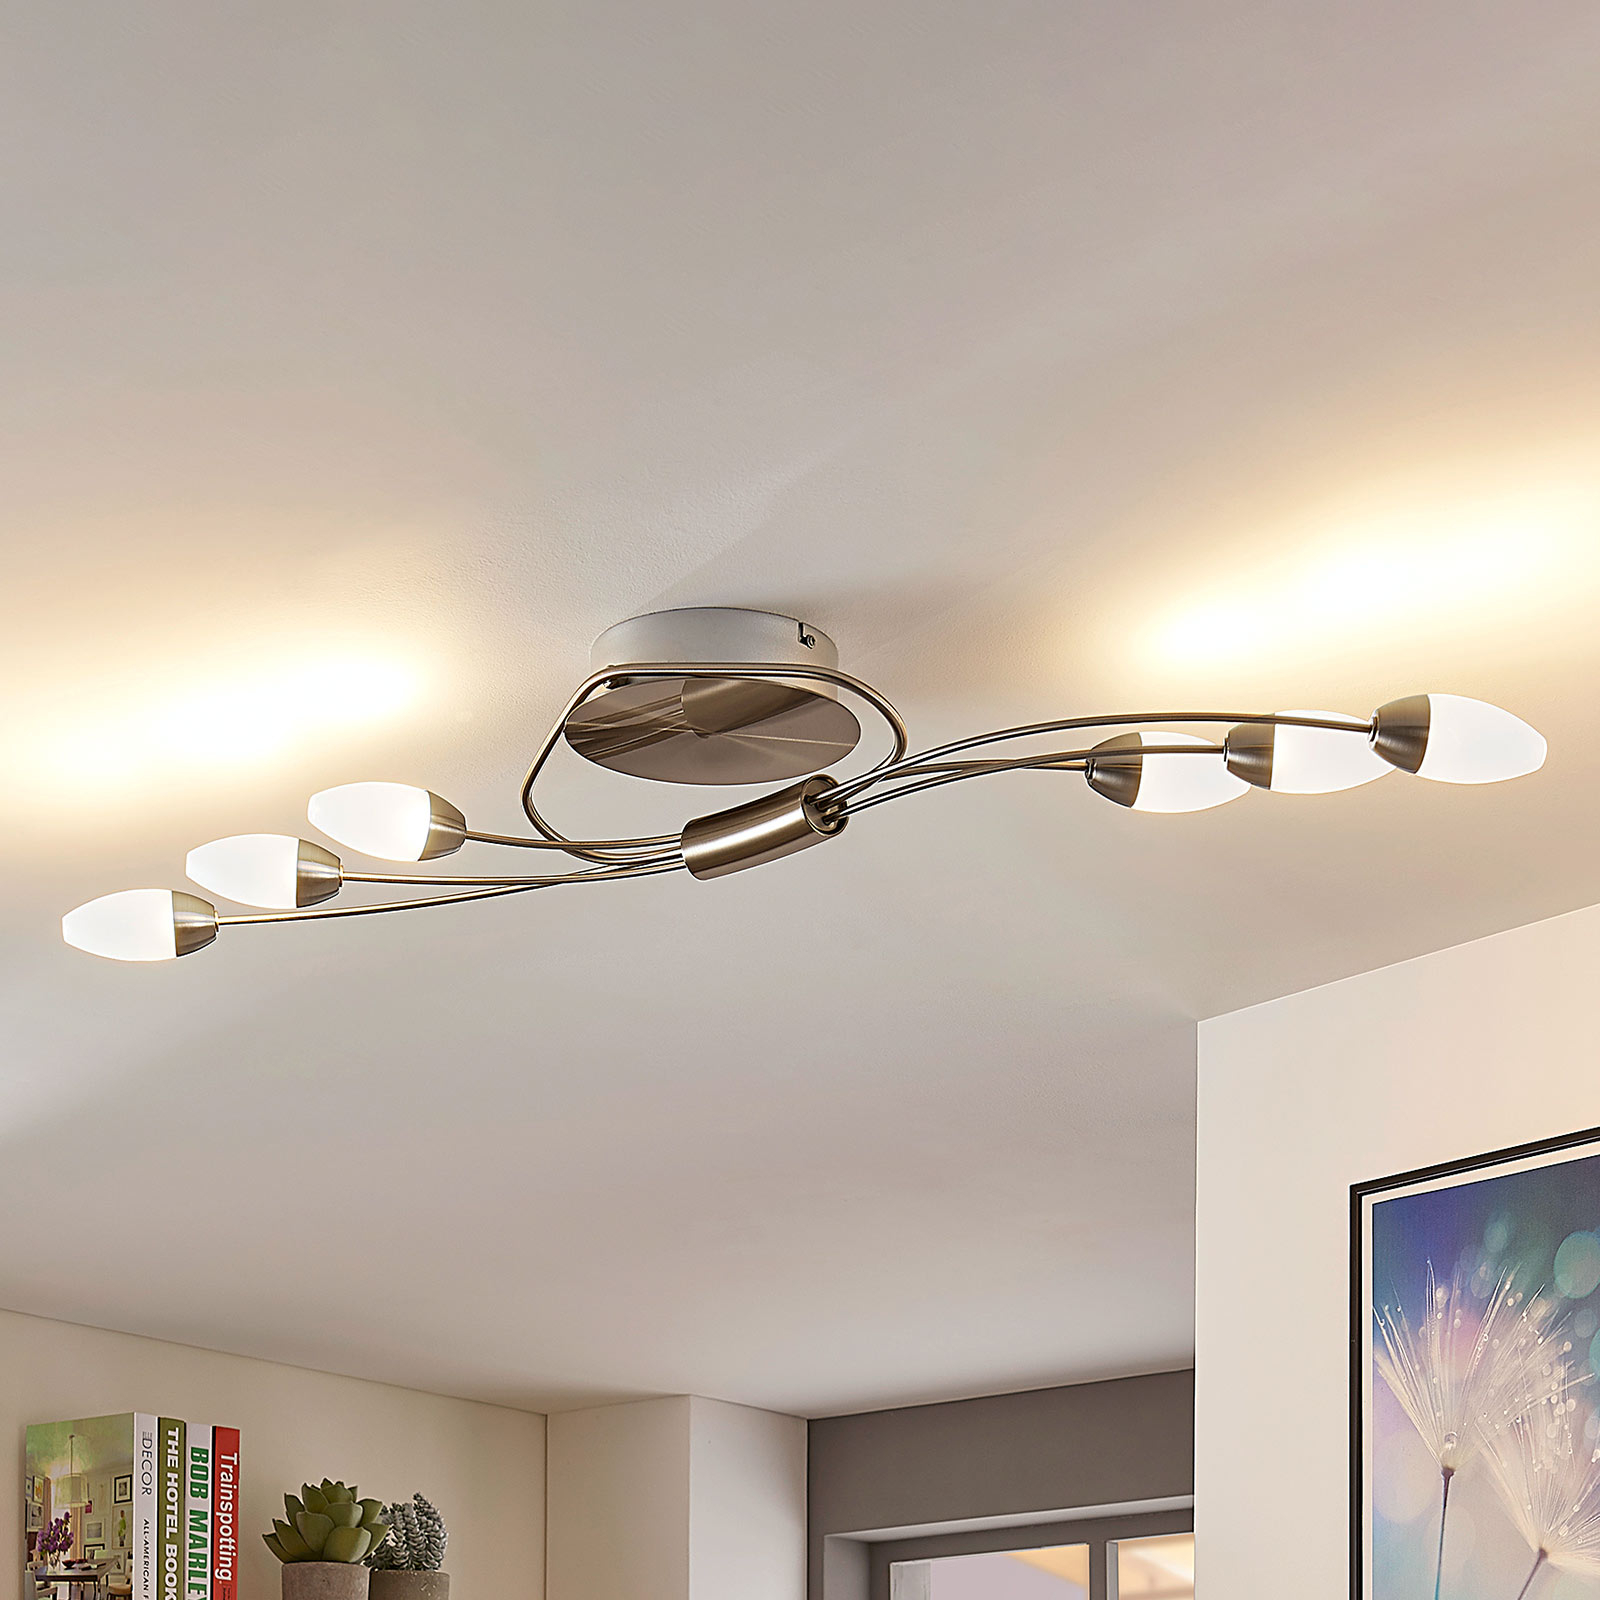 LED plafondlamp Deyan, 6 lampen, langwerpig